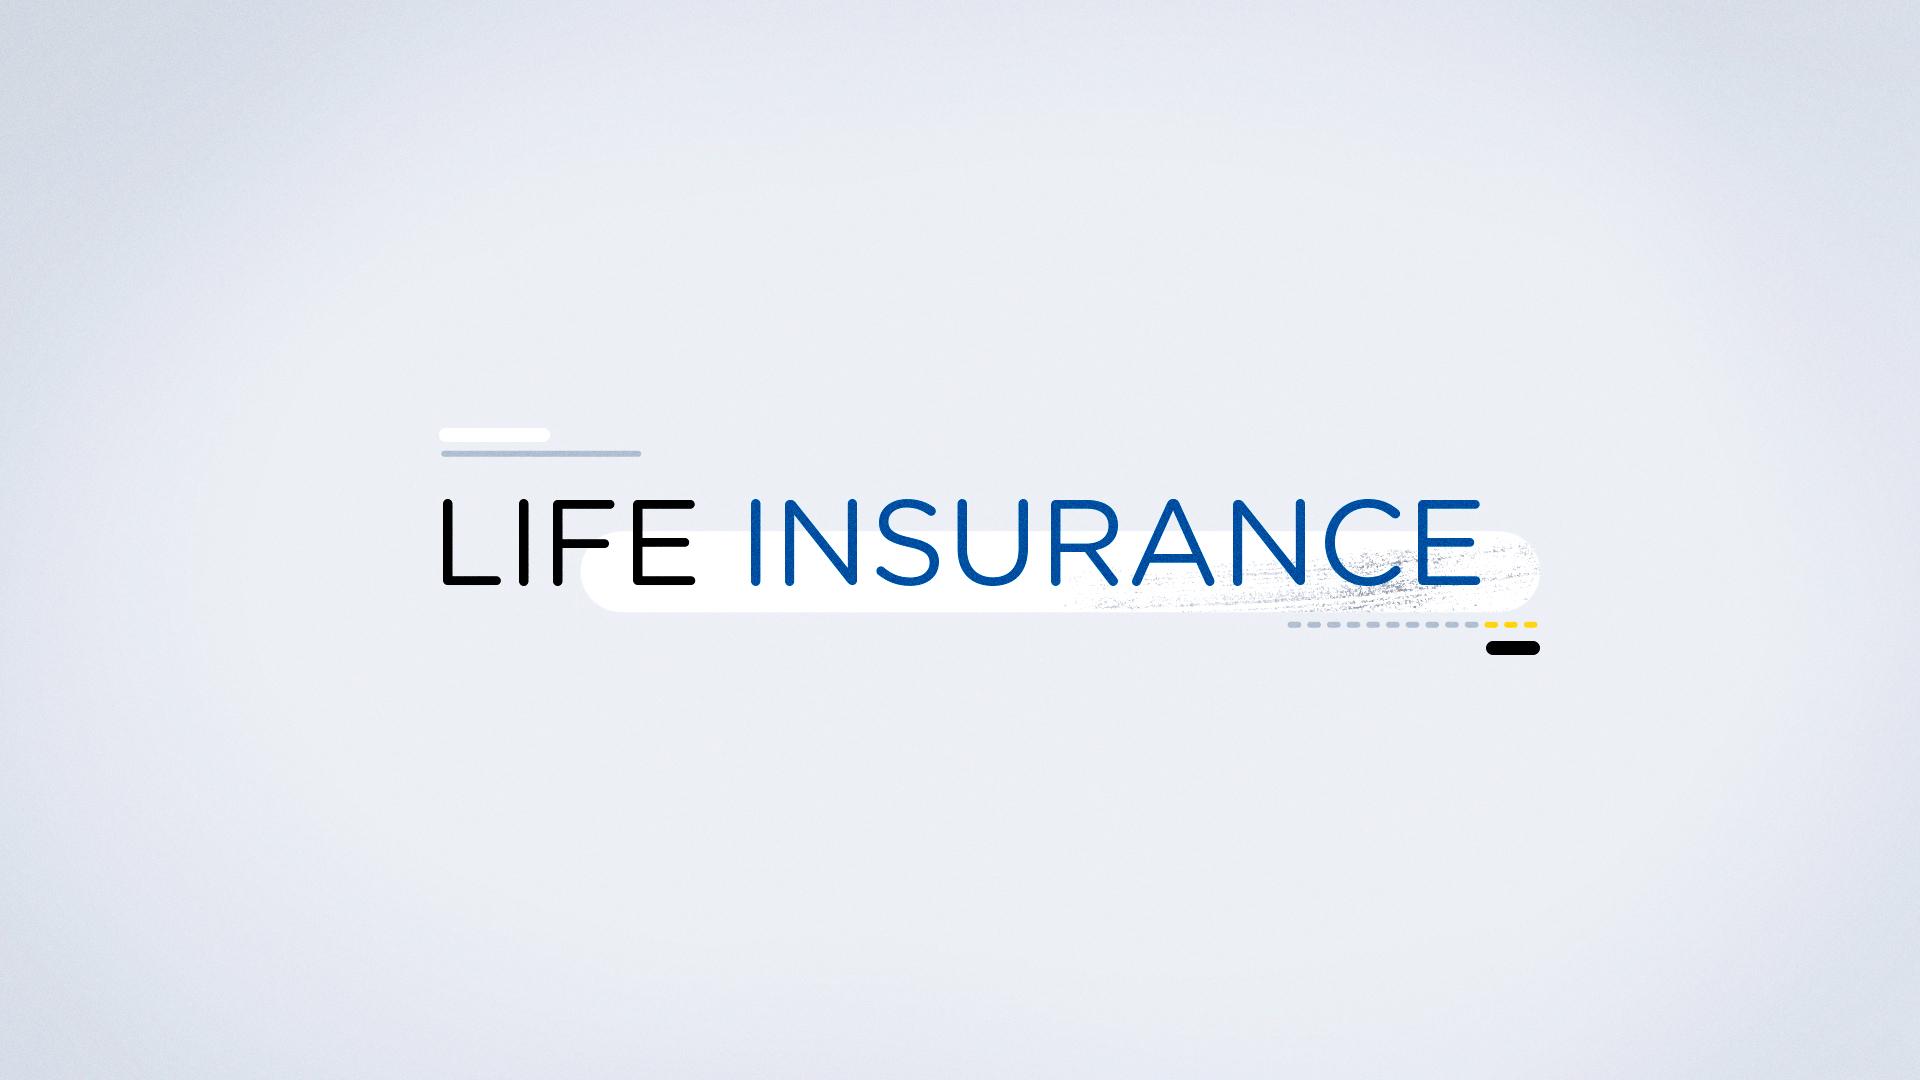 1_life_insurance_v1a.jpg